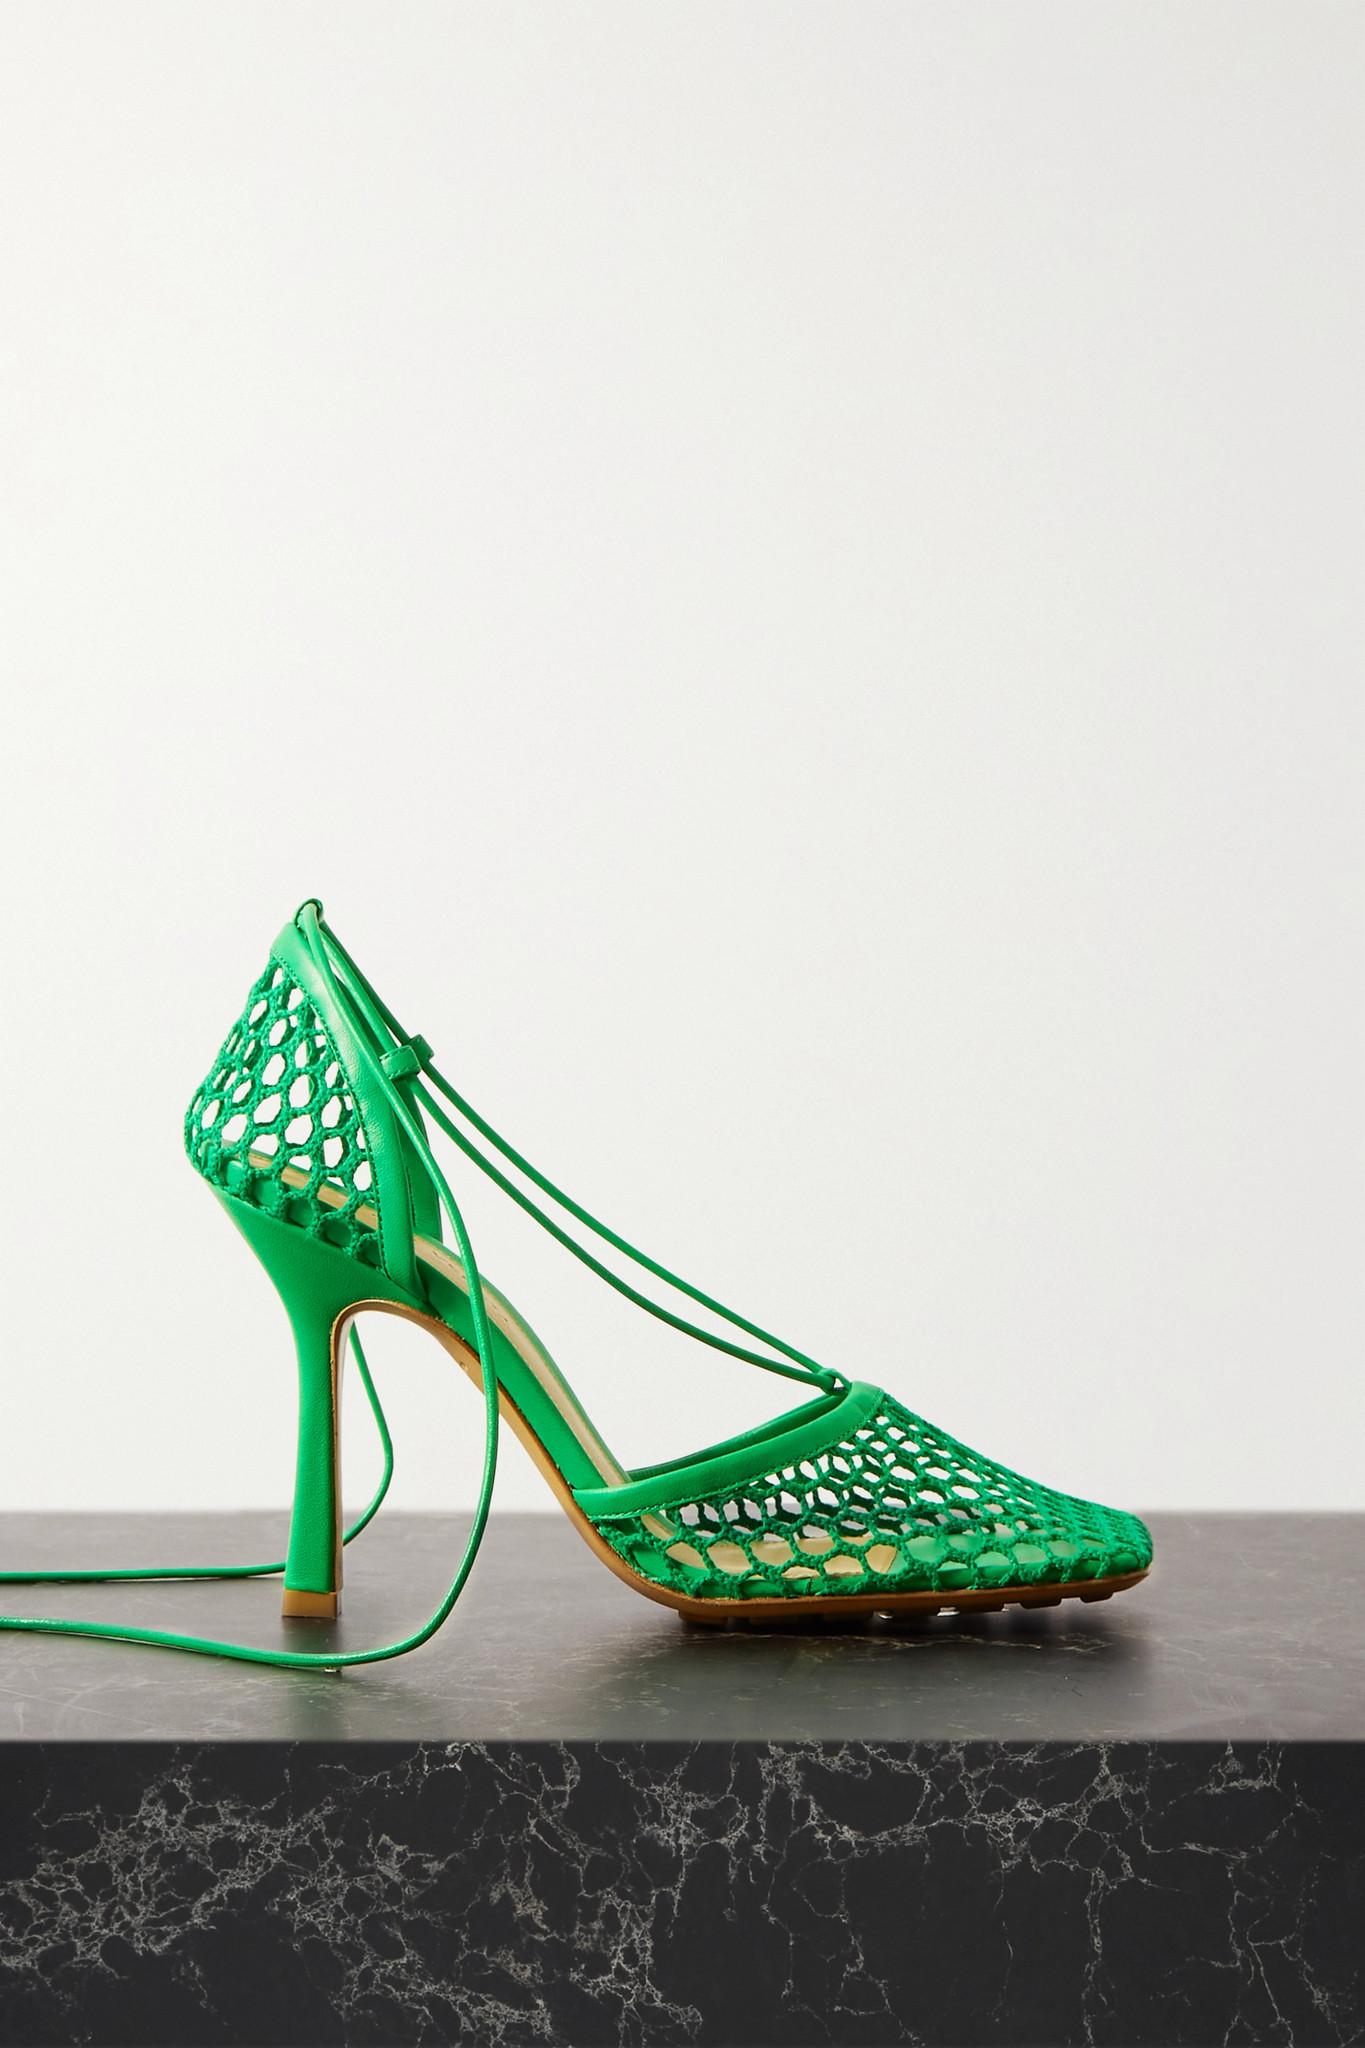 BOTTEGA VENETA - 绑带式皮革边饰网布高跟鞋 - 绿色 - IT38